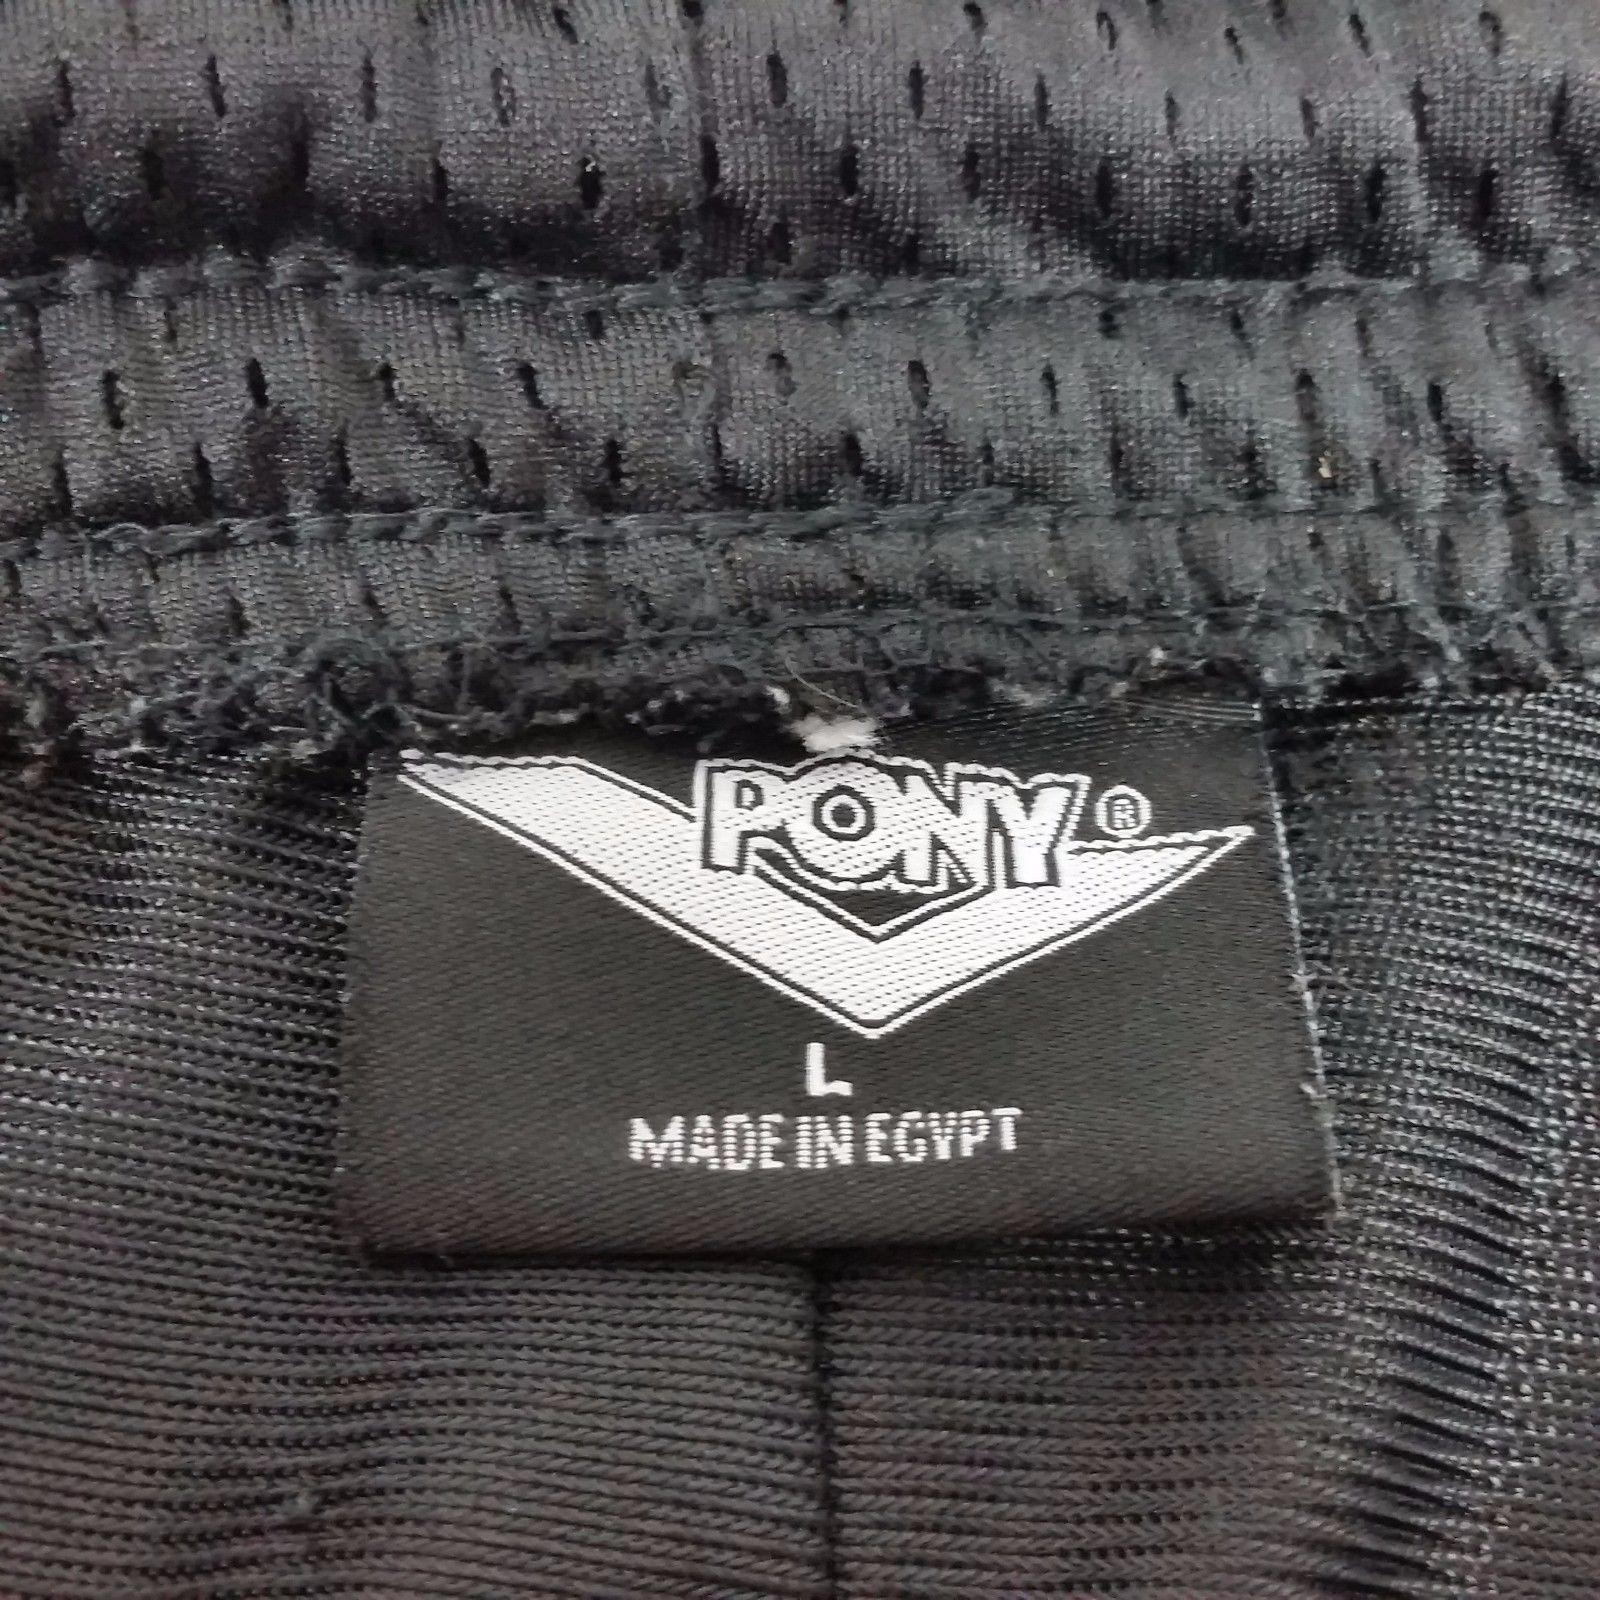 Pony Athletic Basketball Reversible Shorts Mens Large Black Red Pockets 90s